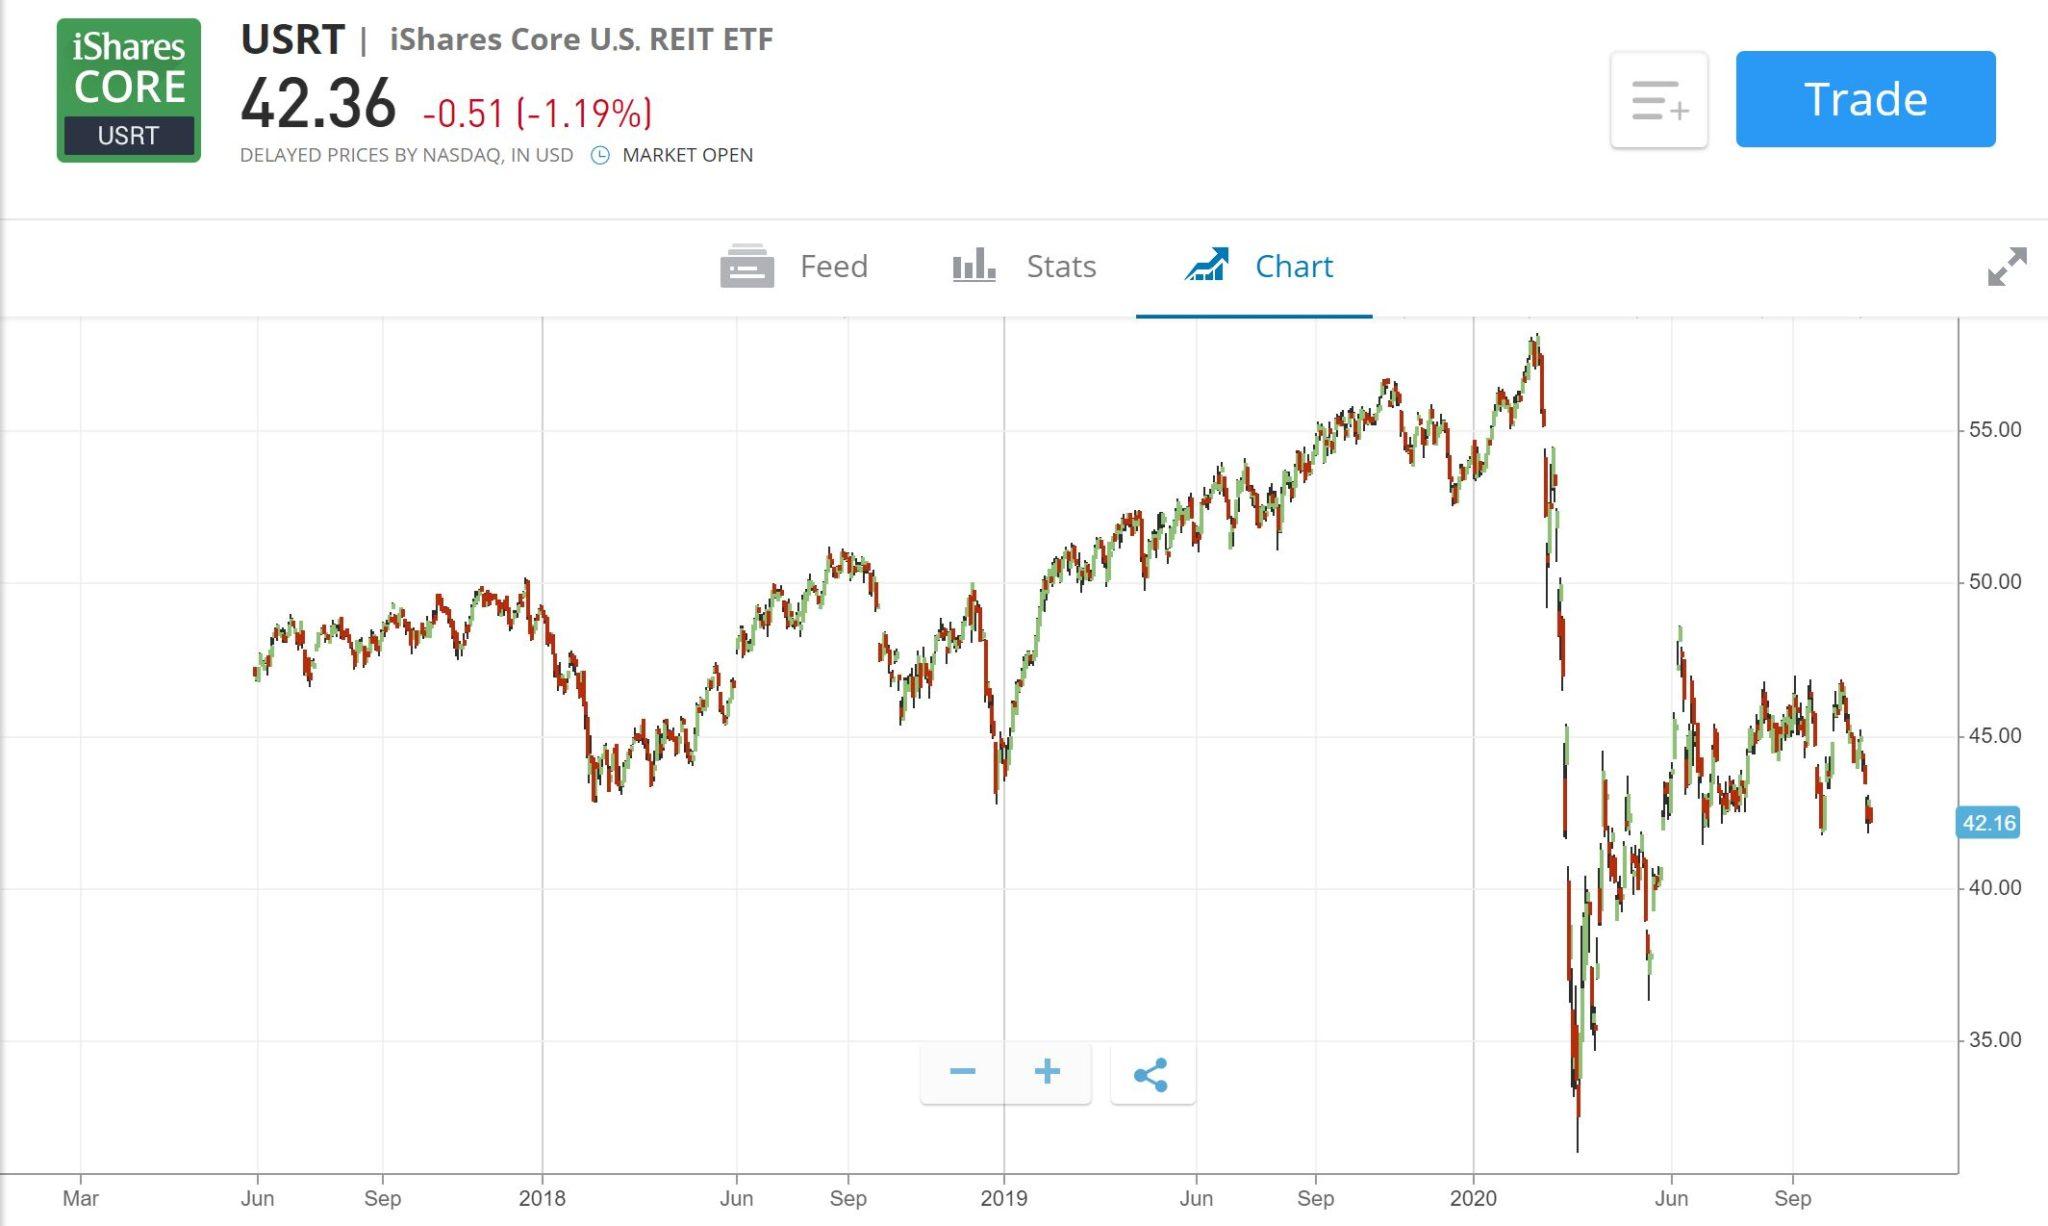 US REIT ETF price chart